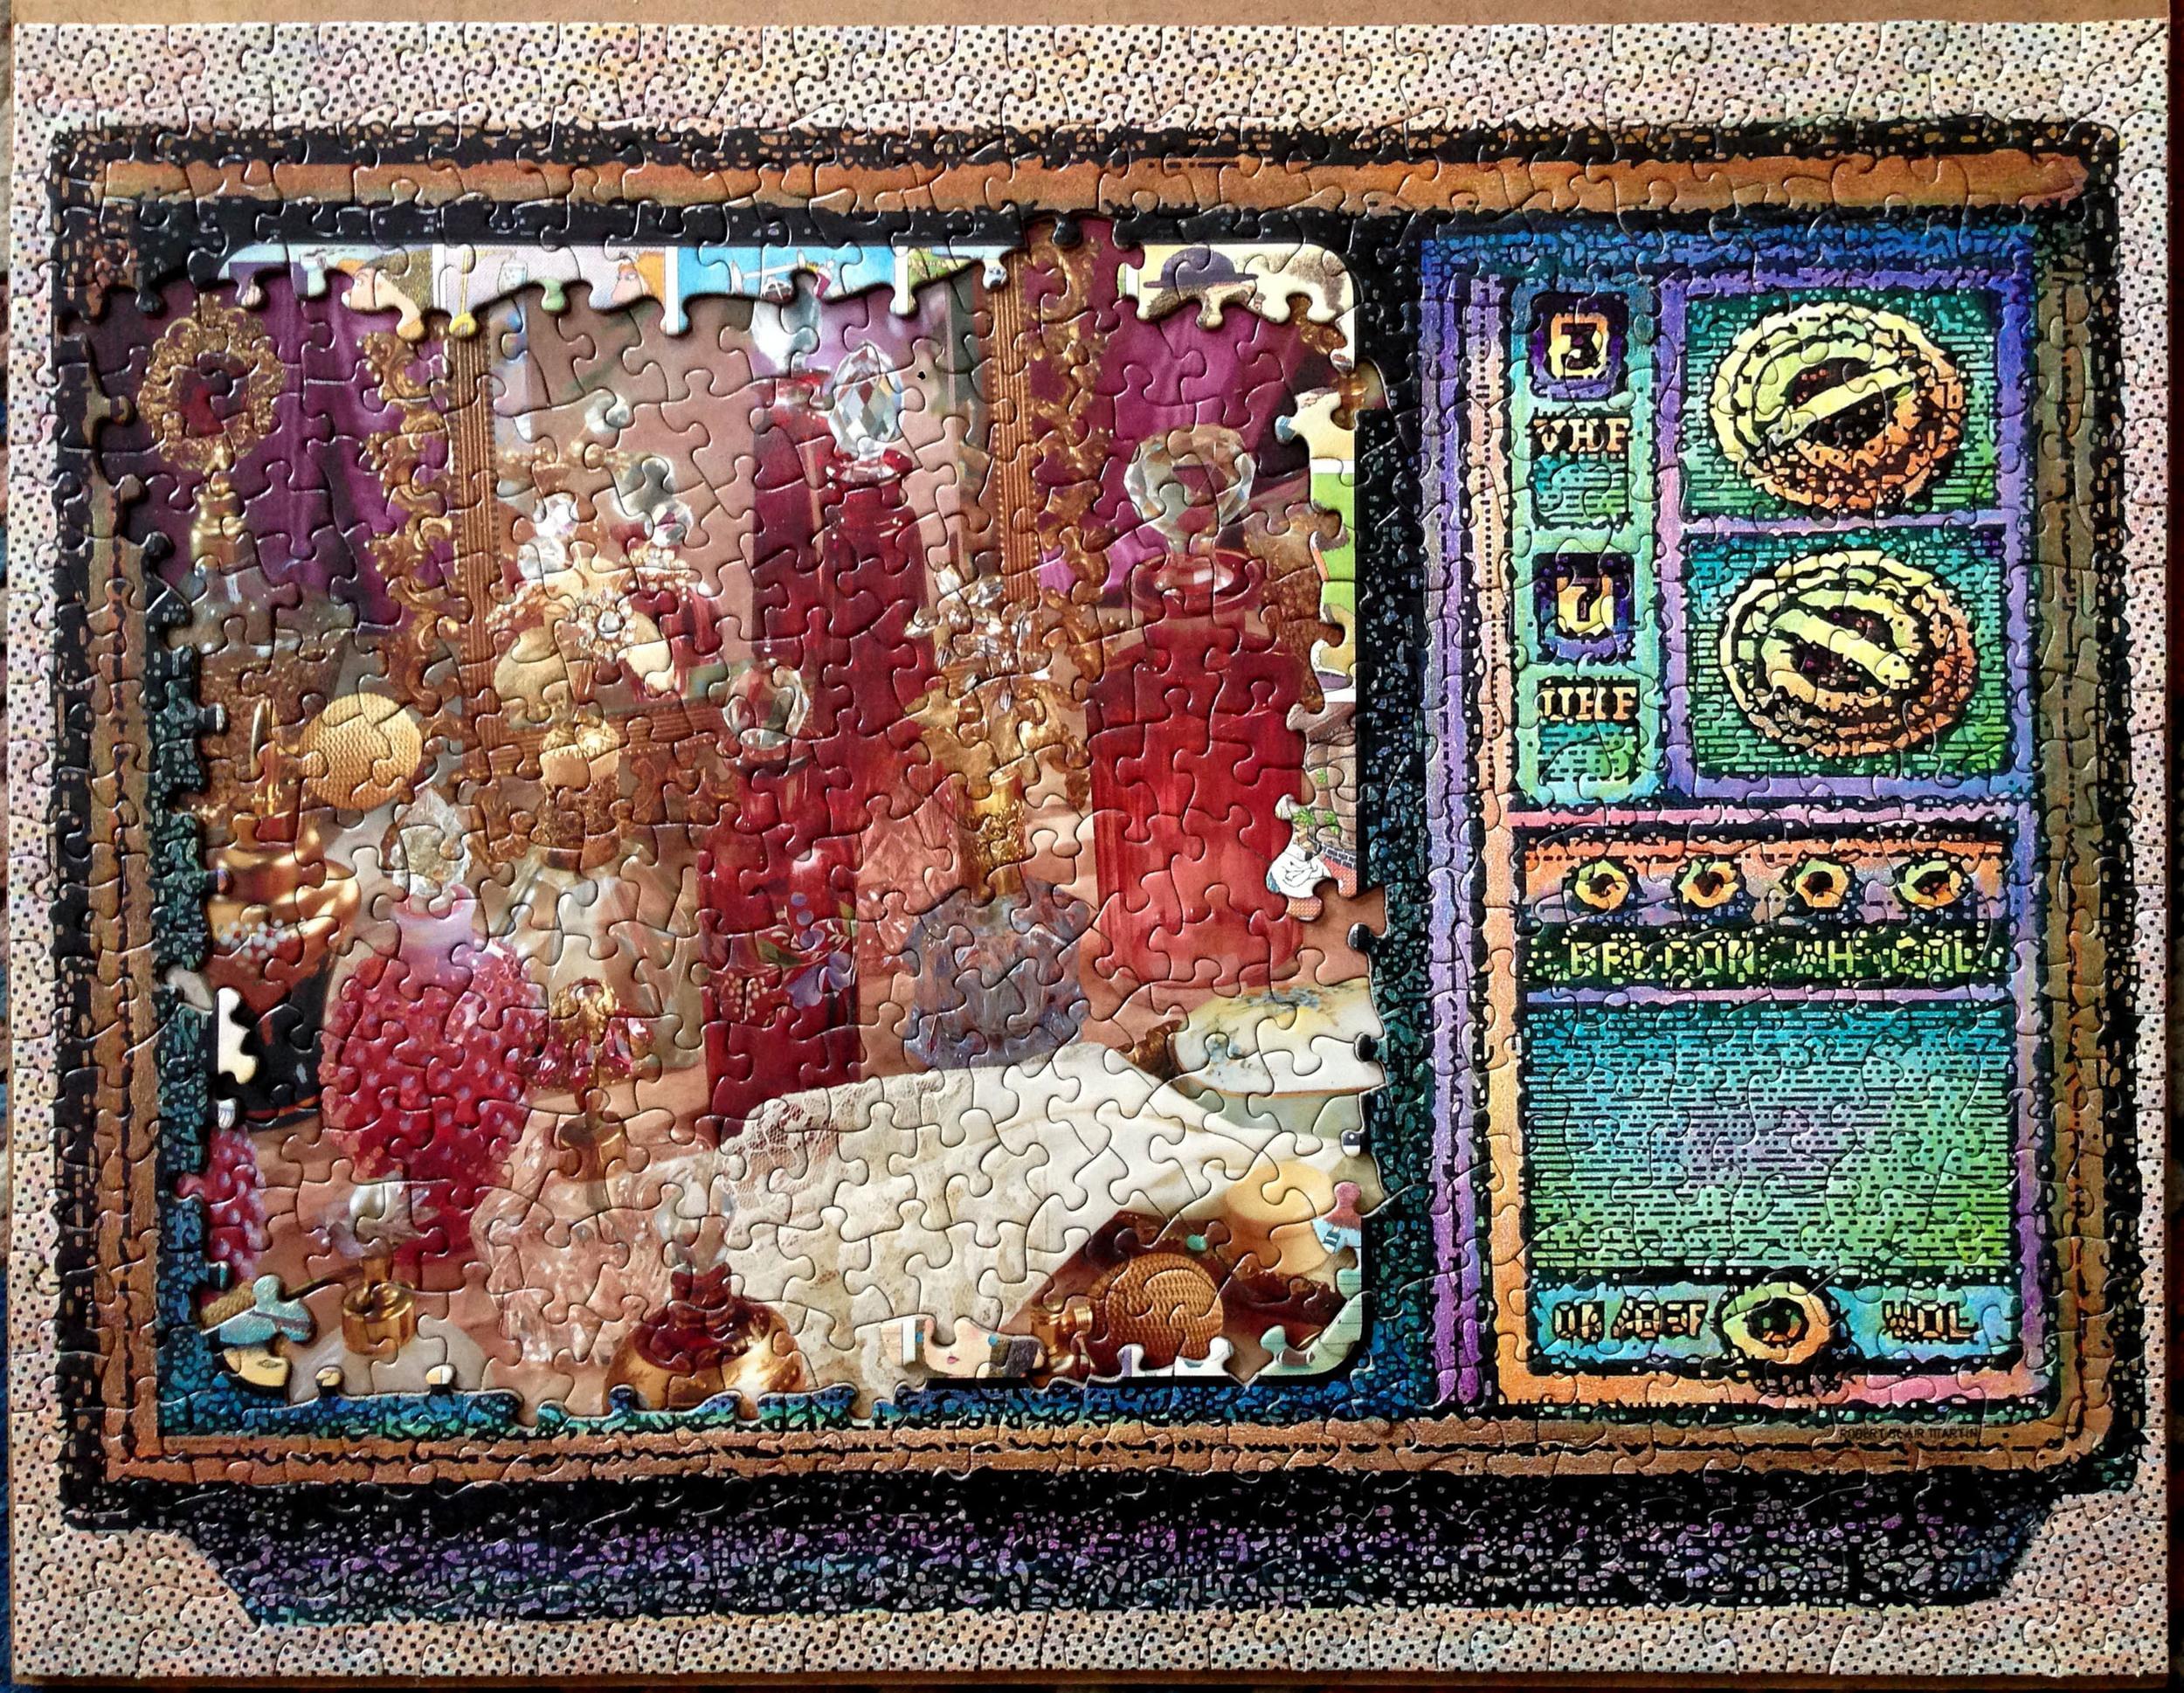 QVC, puzzle collage, 2015